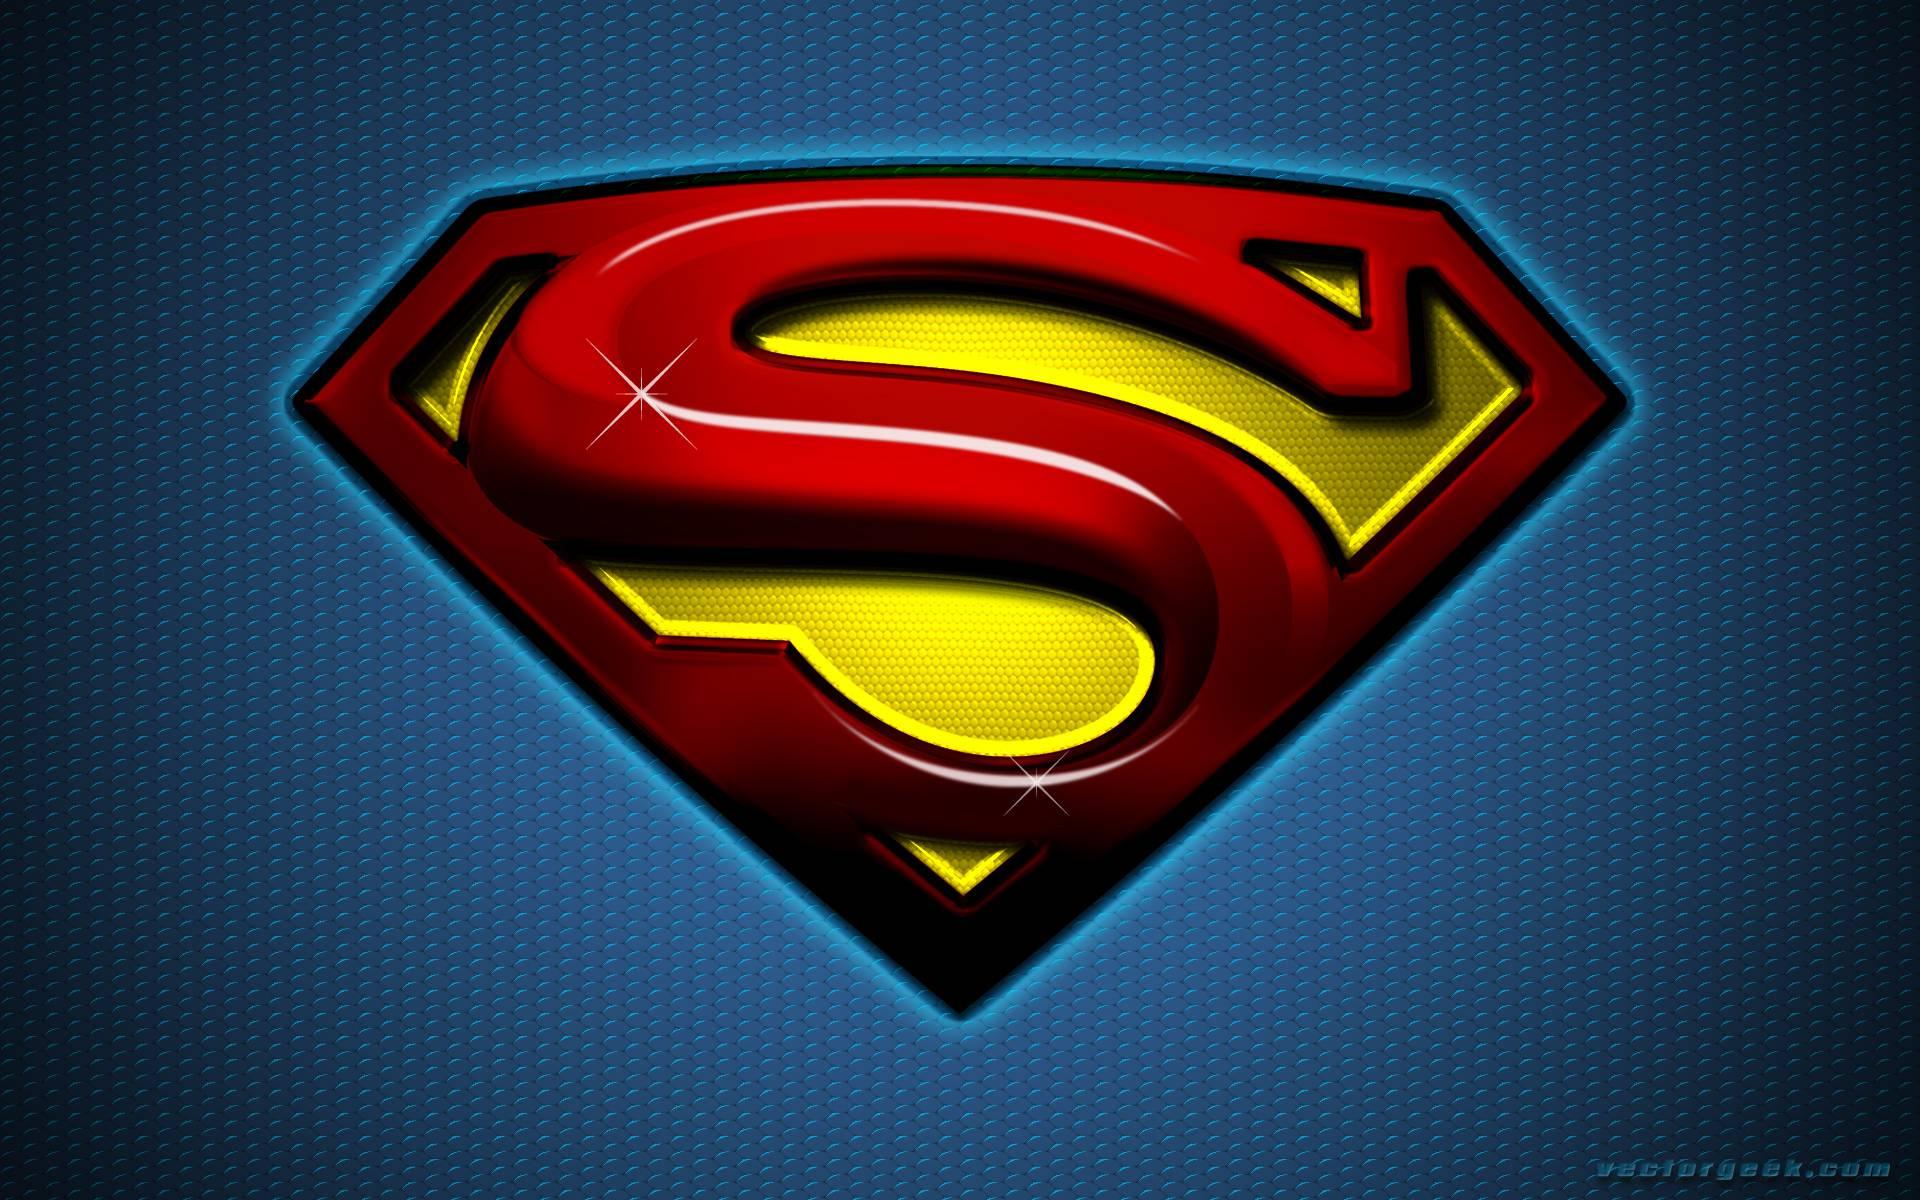 Superman Logo Wallpapers   Full HD wallpaper search 1920x1200